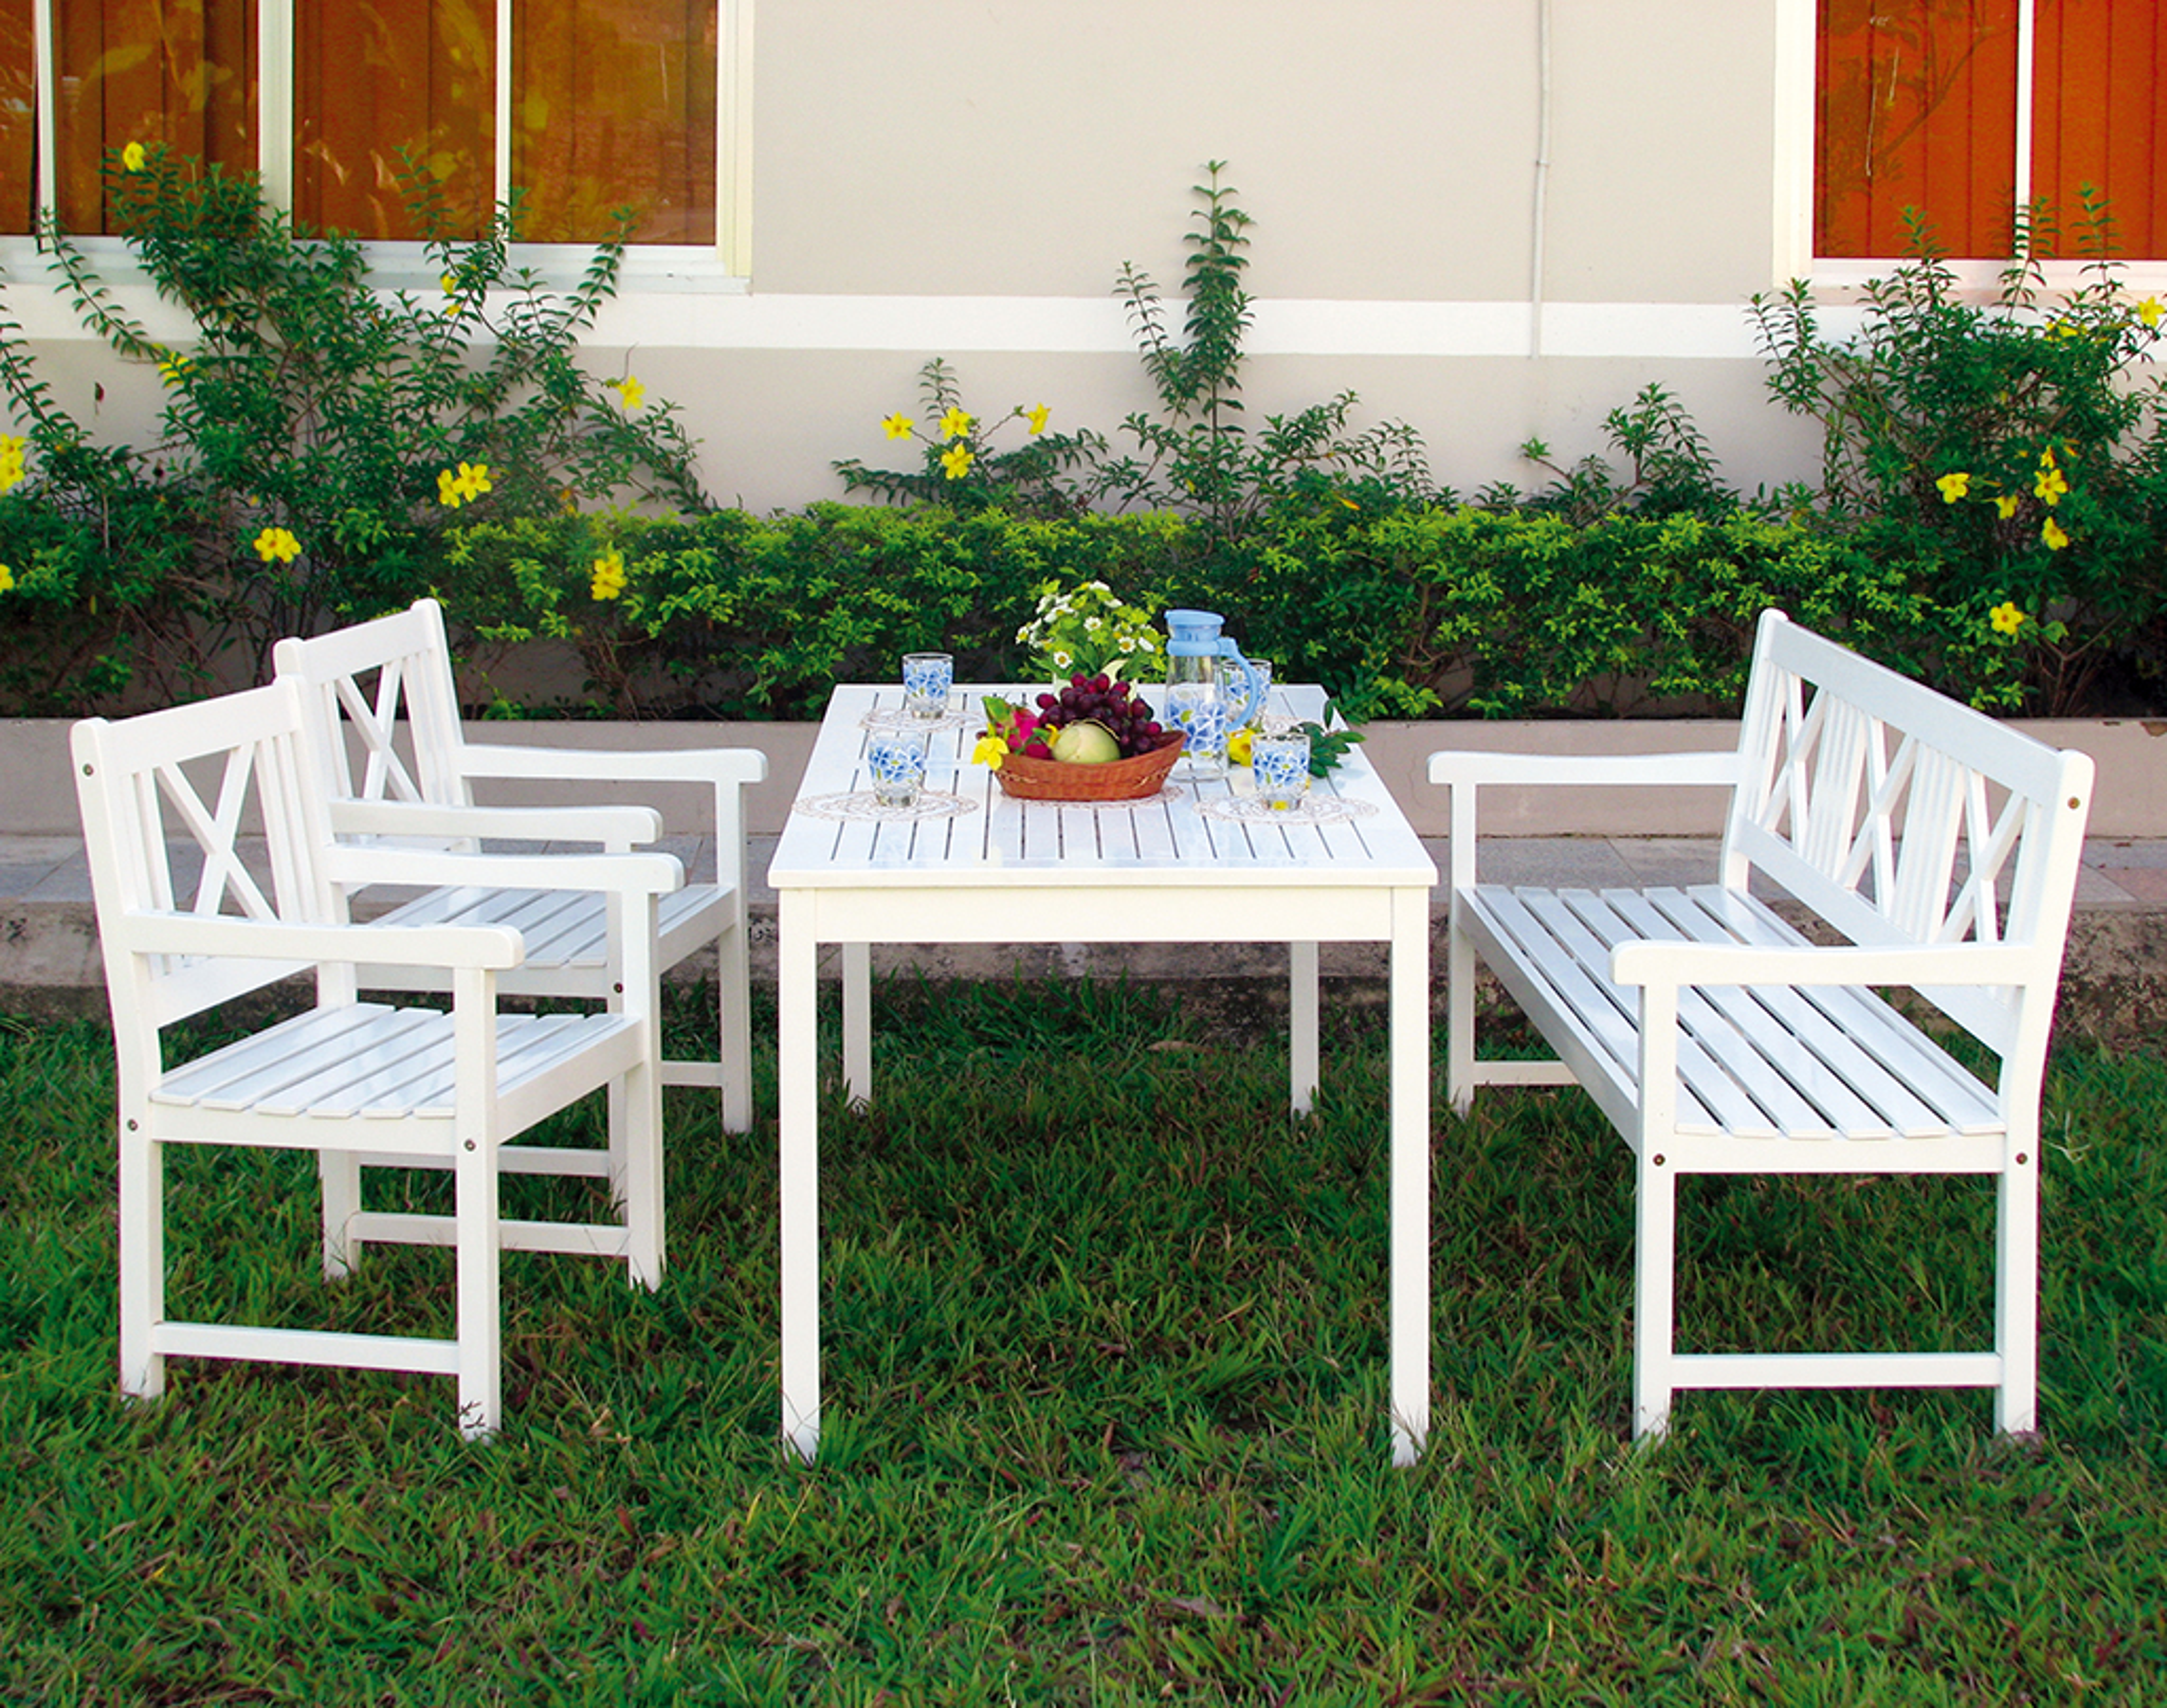 Sitzgruppe im garten gartenmobel sets  Tischgruppe Sitzgruppe Gartengarnitur Gartenmöbel Garten Bank Tisch ...